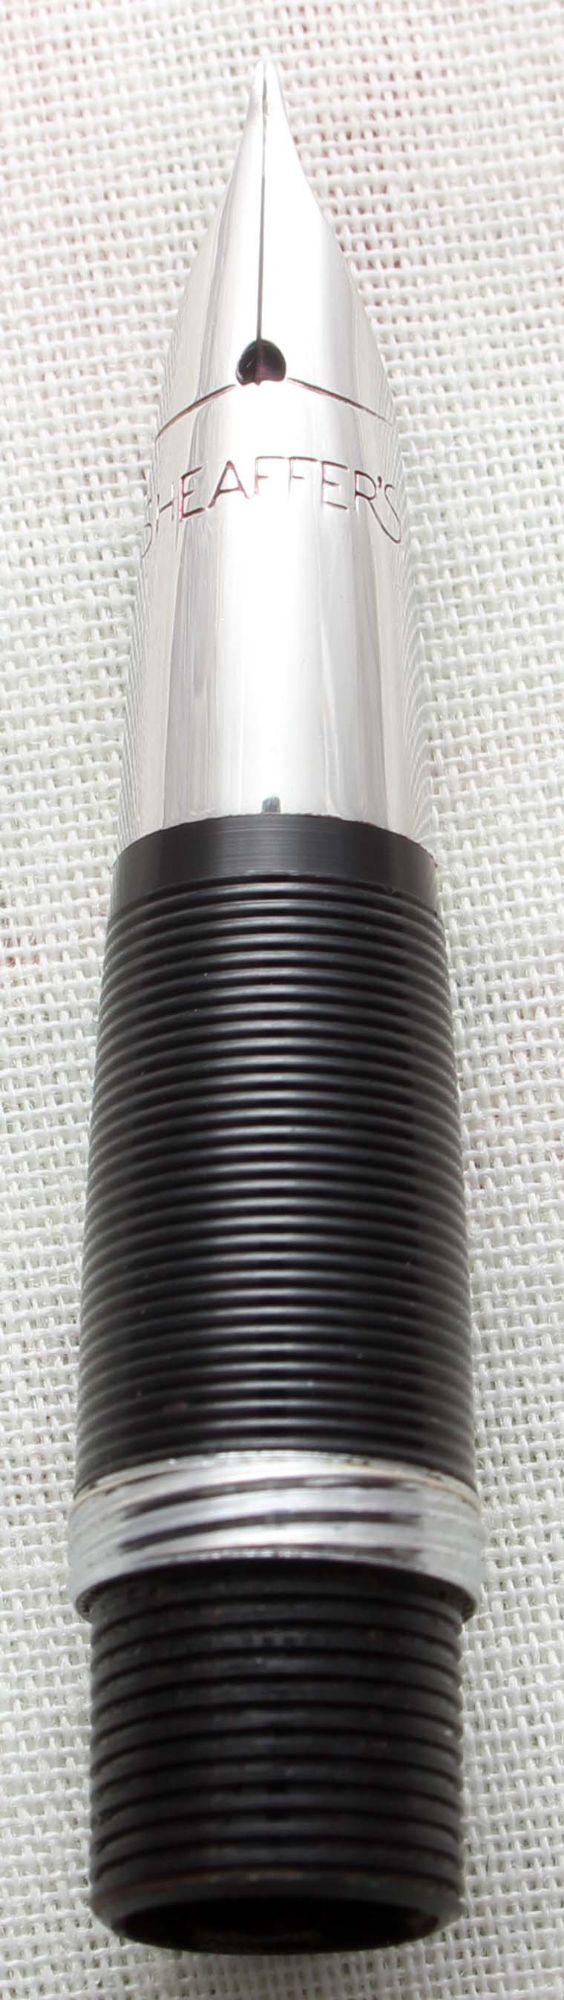 Sheaffer Snorkel Nib Unit. (Fine) N511